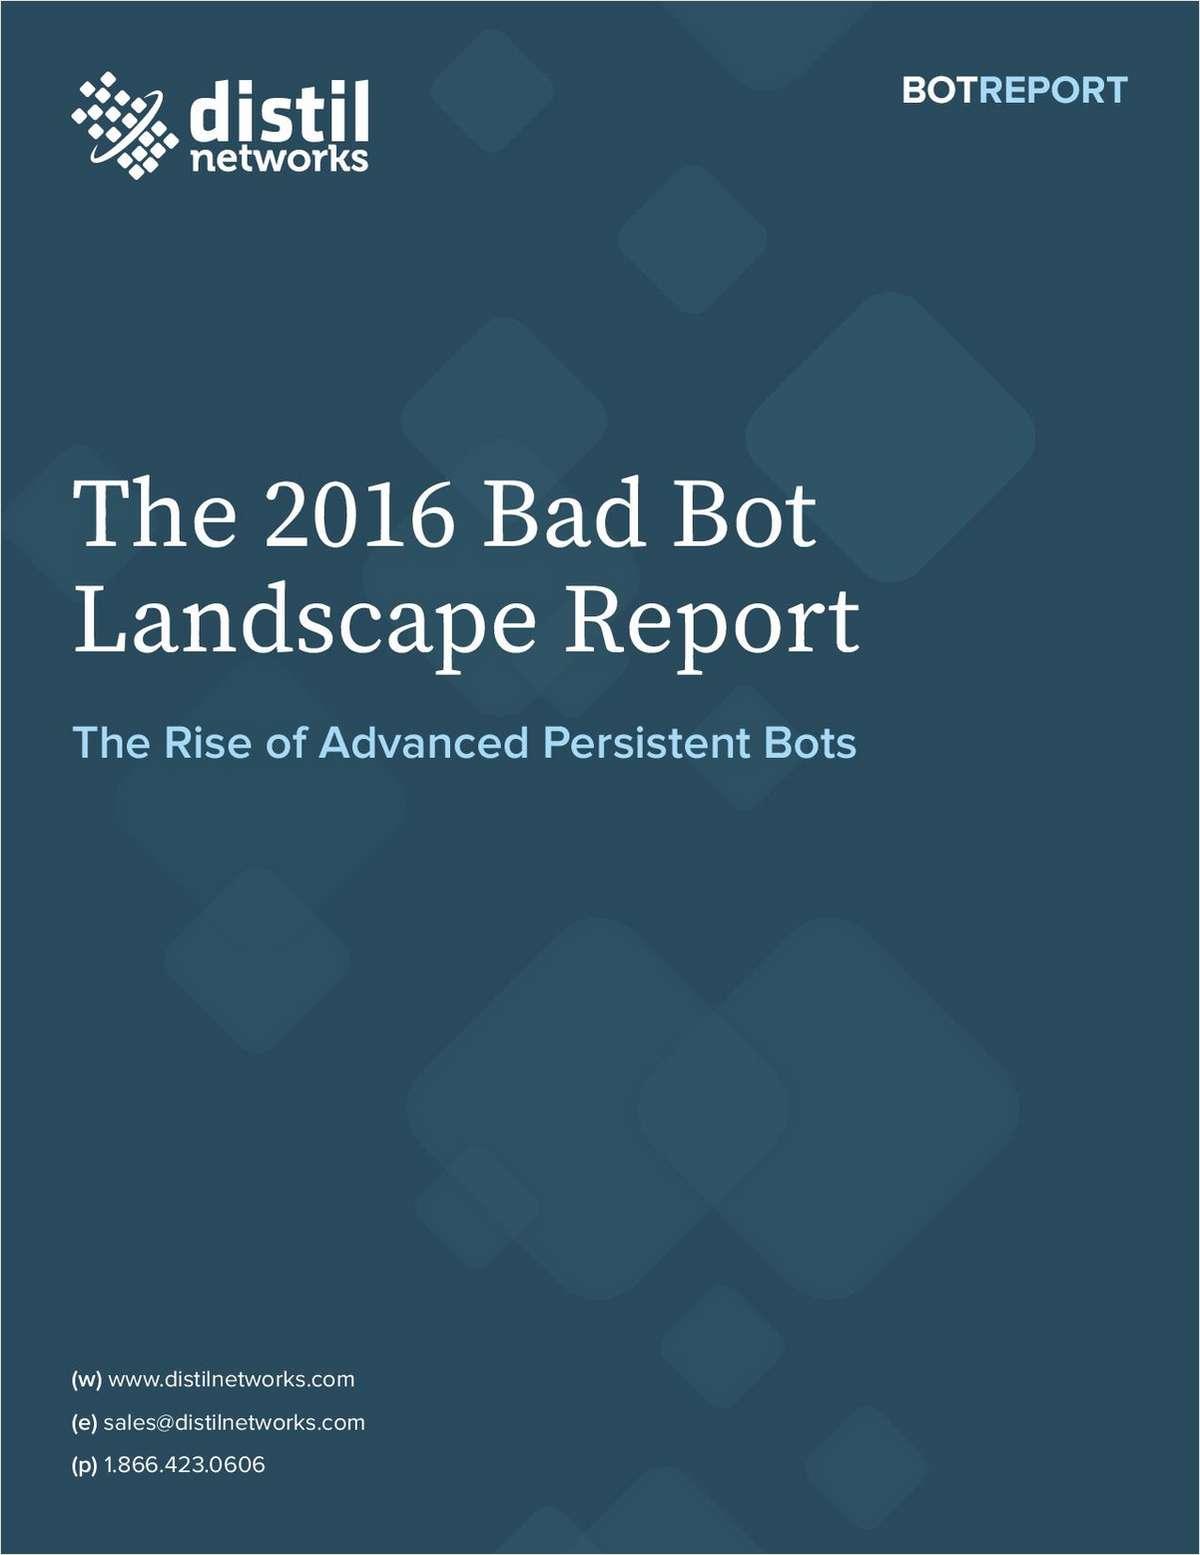 The 2016 Bad Bot Landscape Report